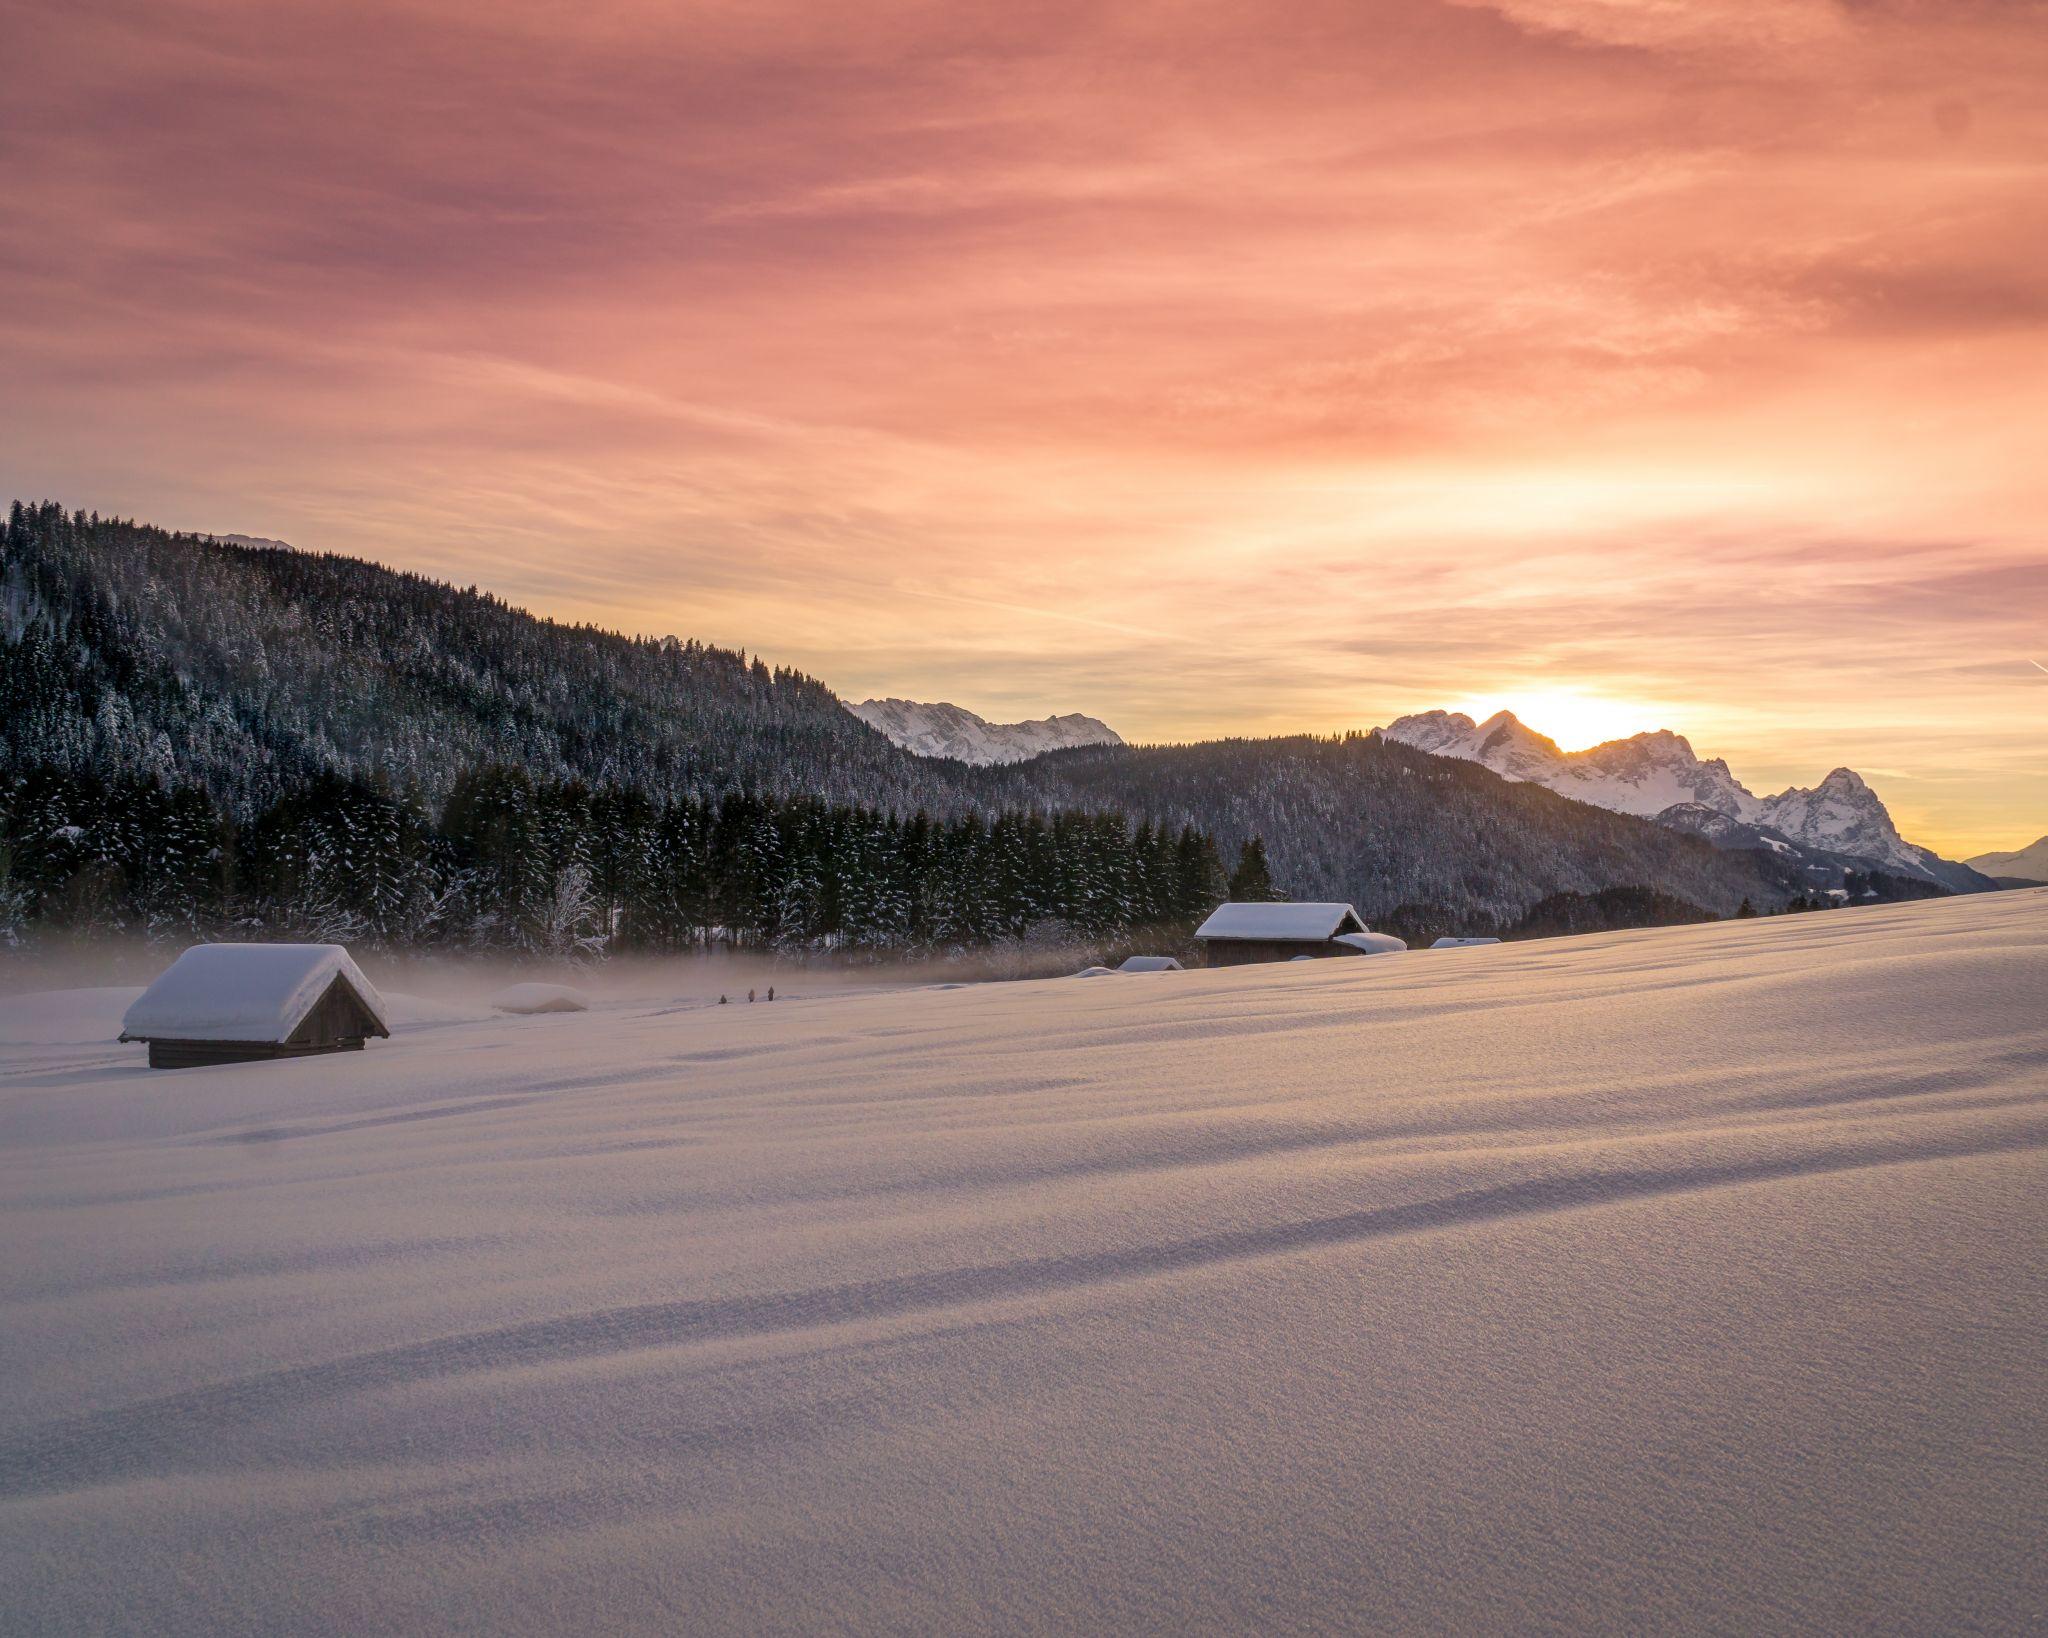 Geroldsee winter sunset, Germany